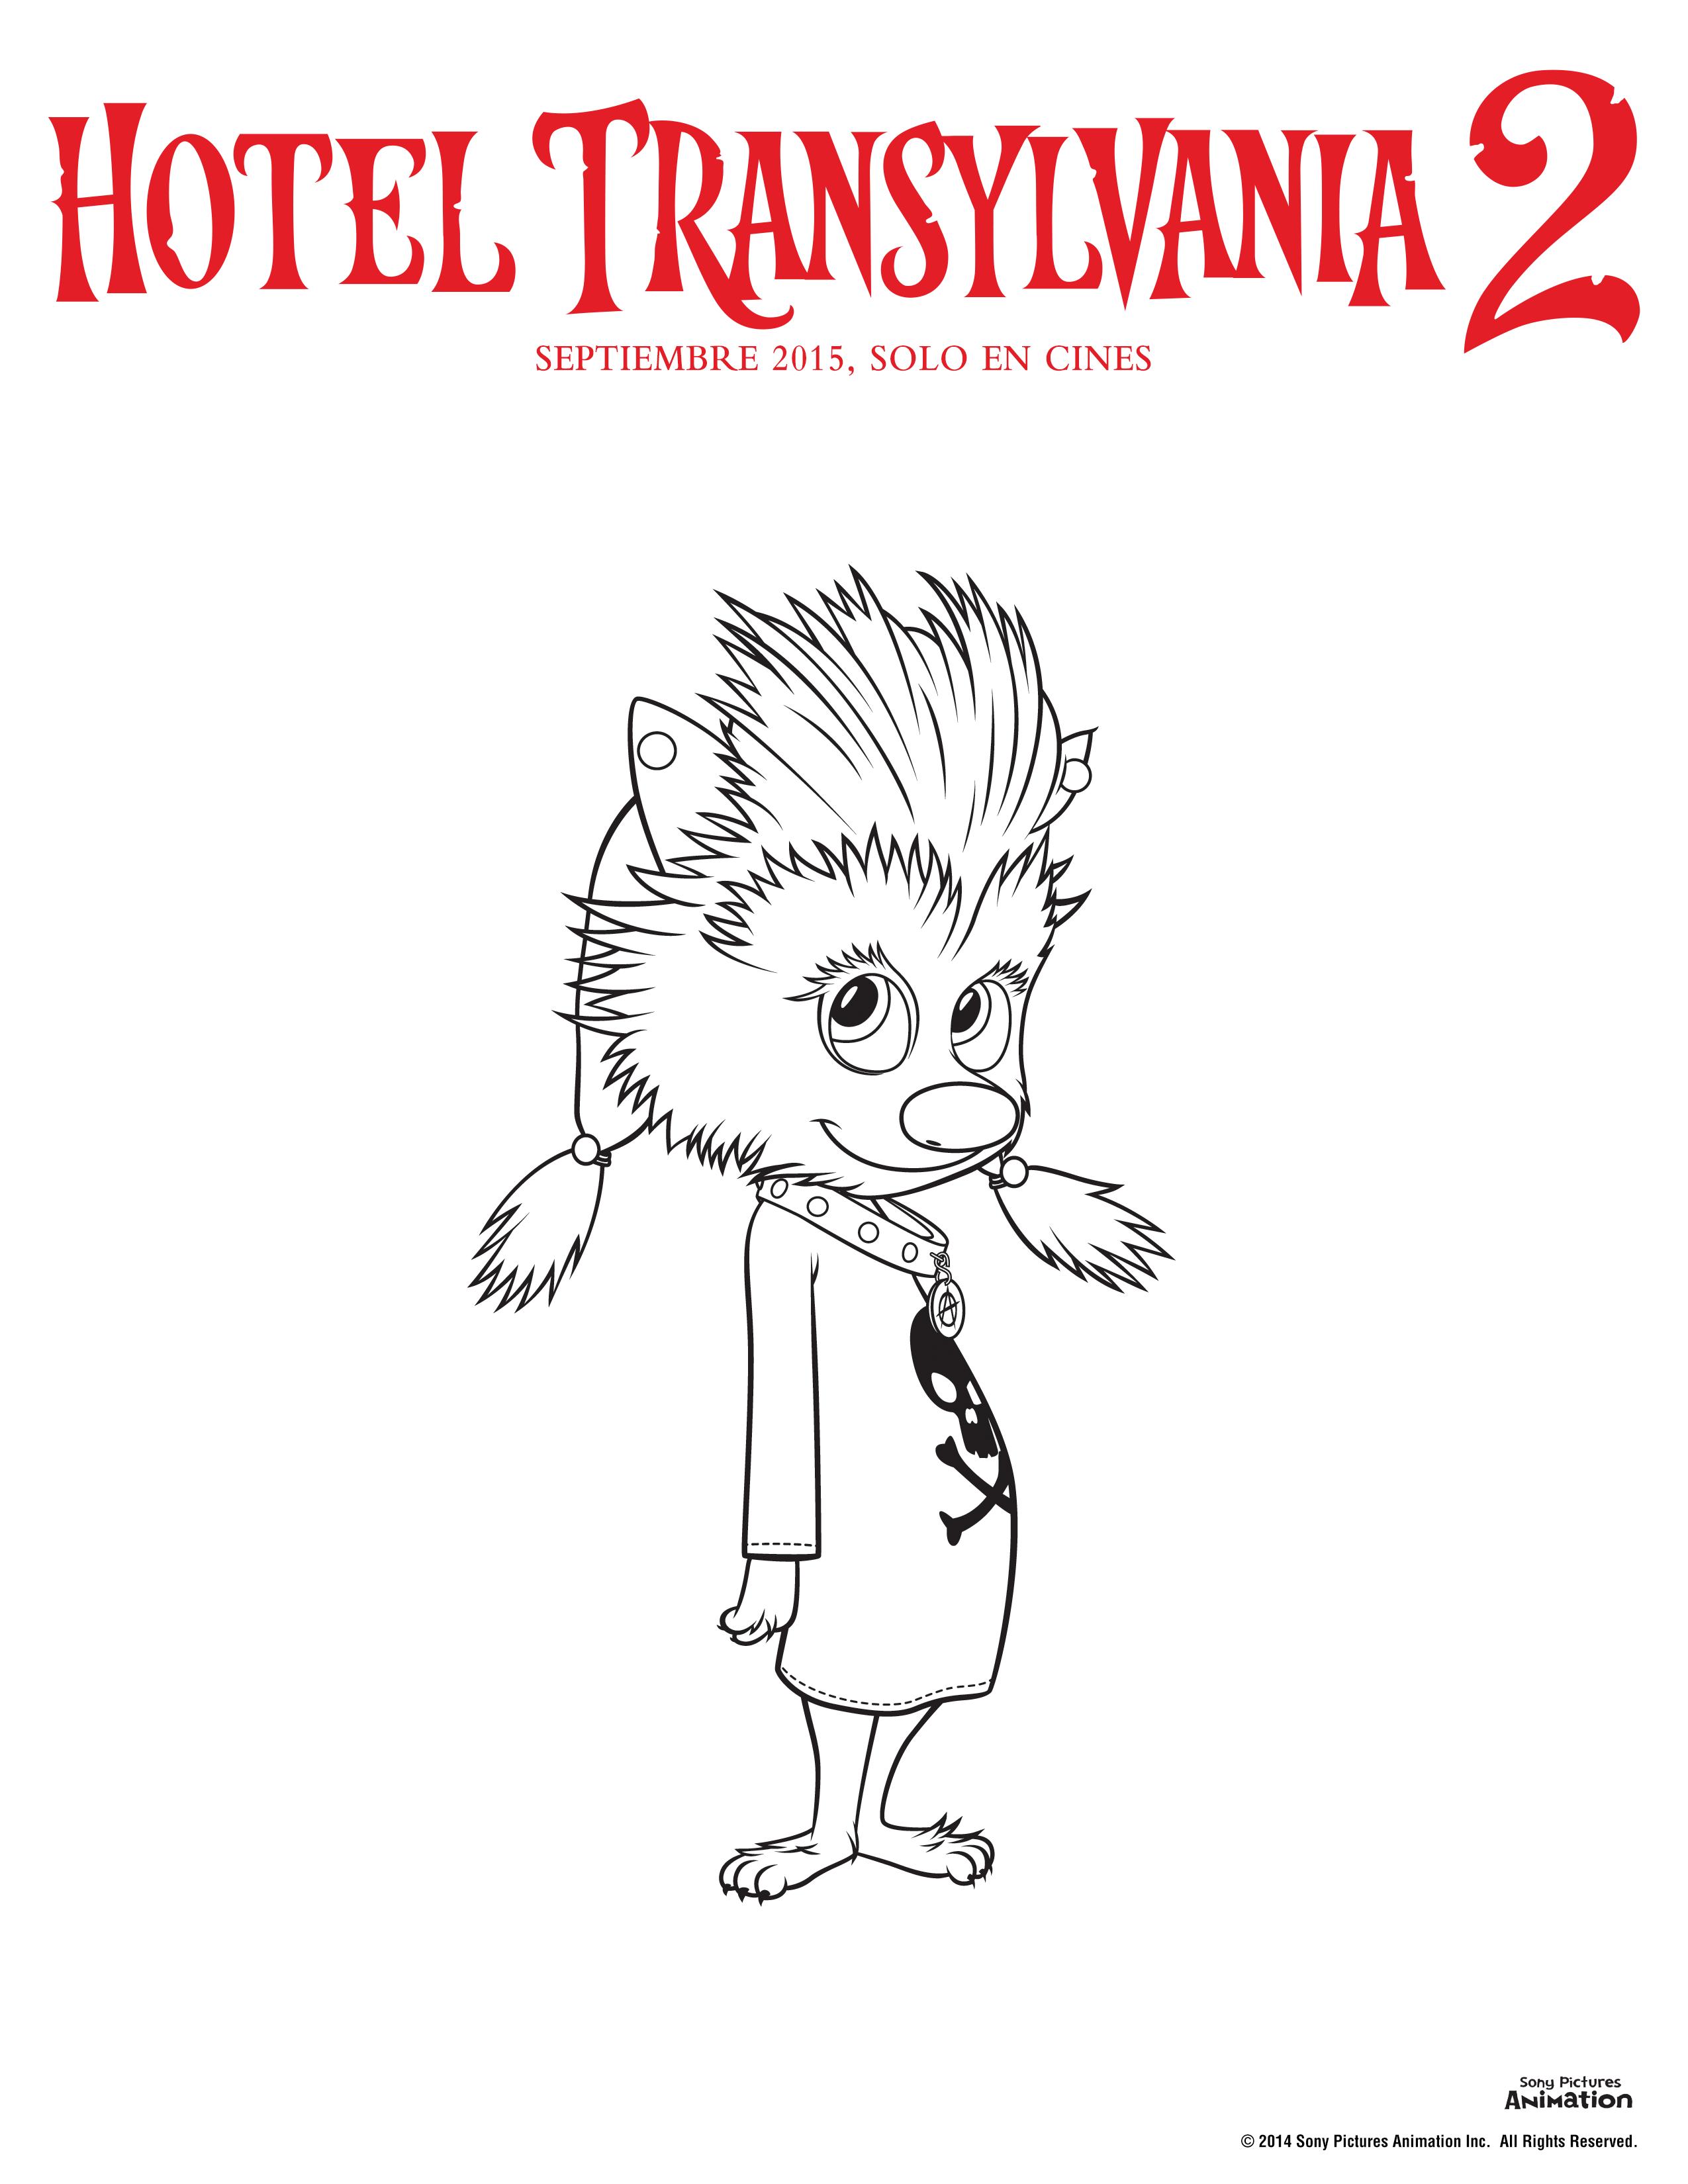 Manualidades Hoteltransylvania2 Halloween In 2019 Hotel